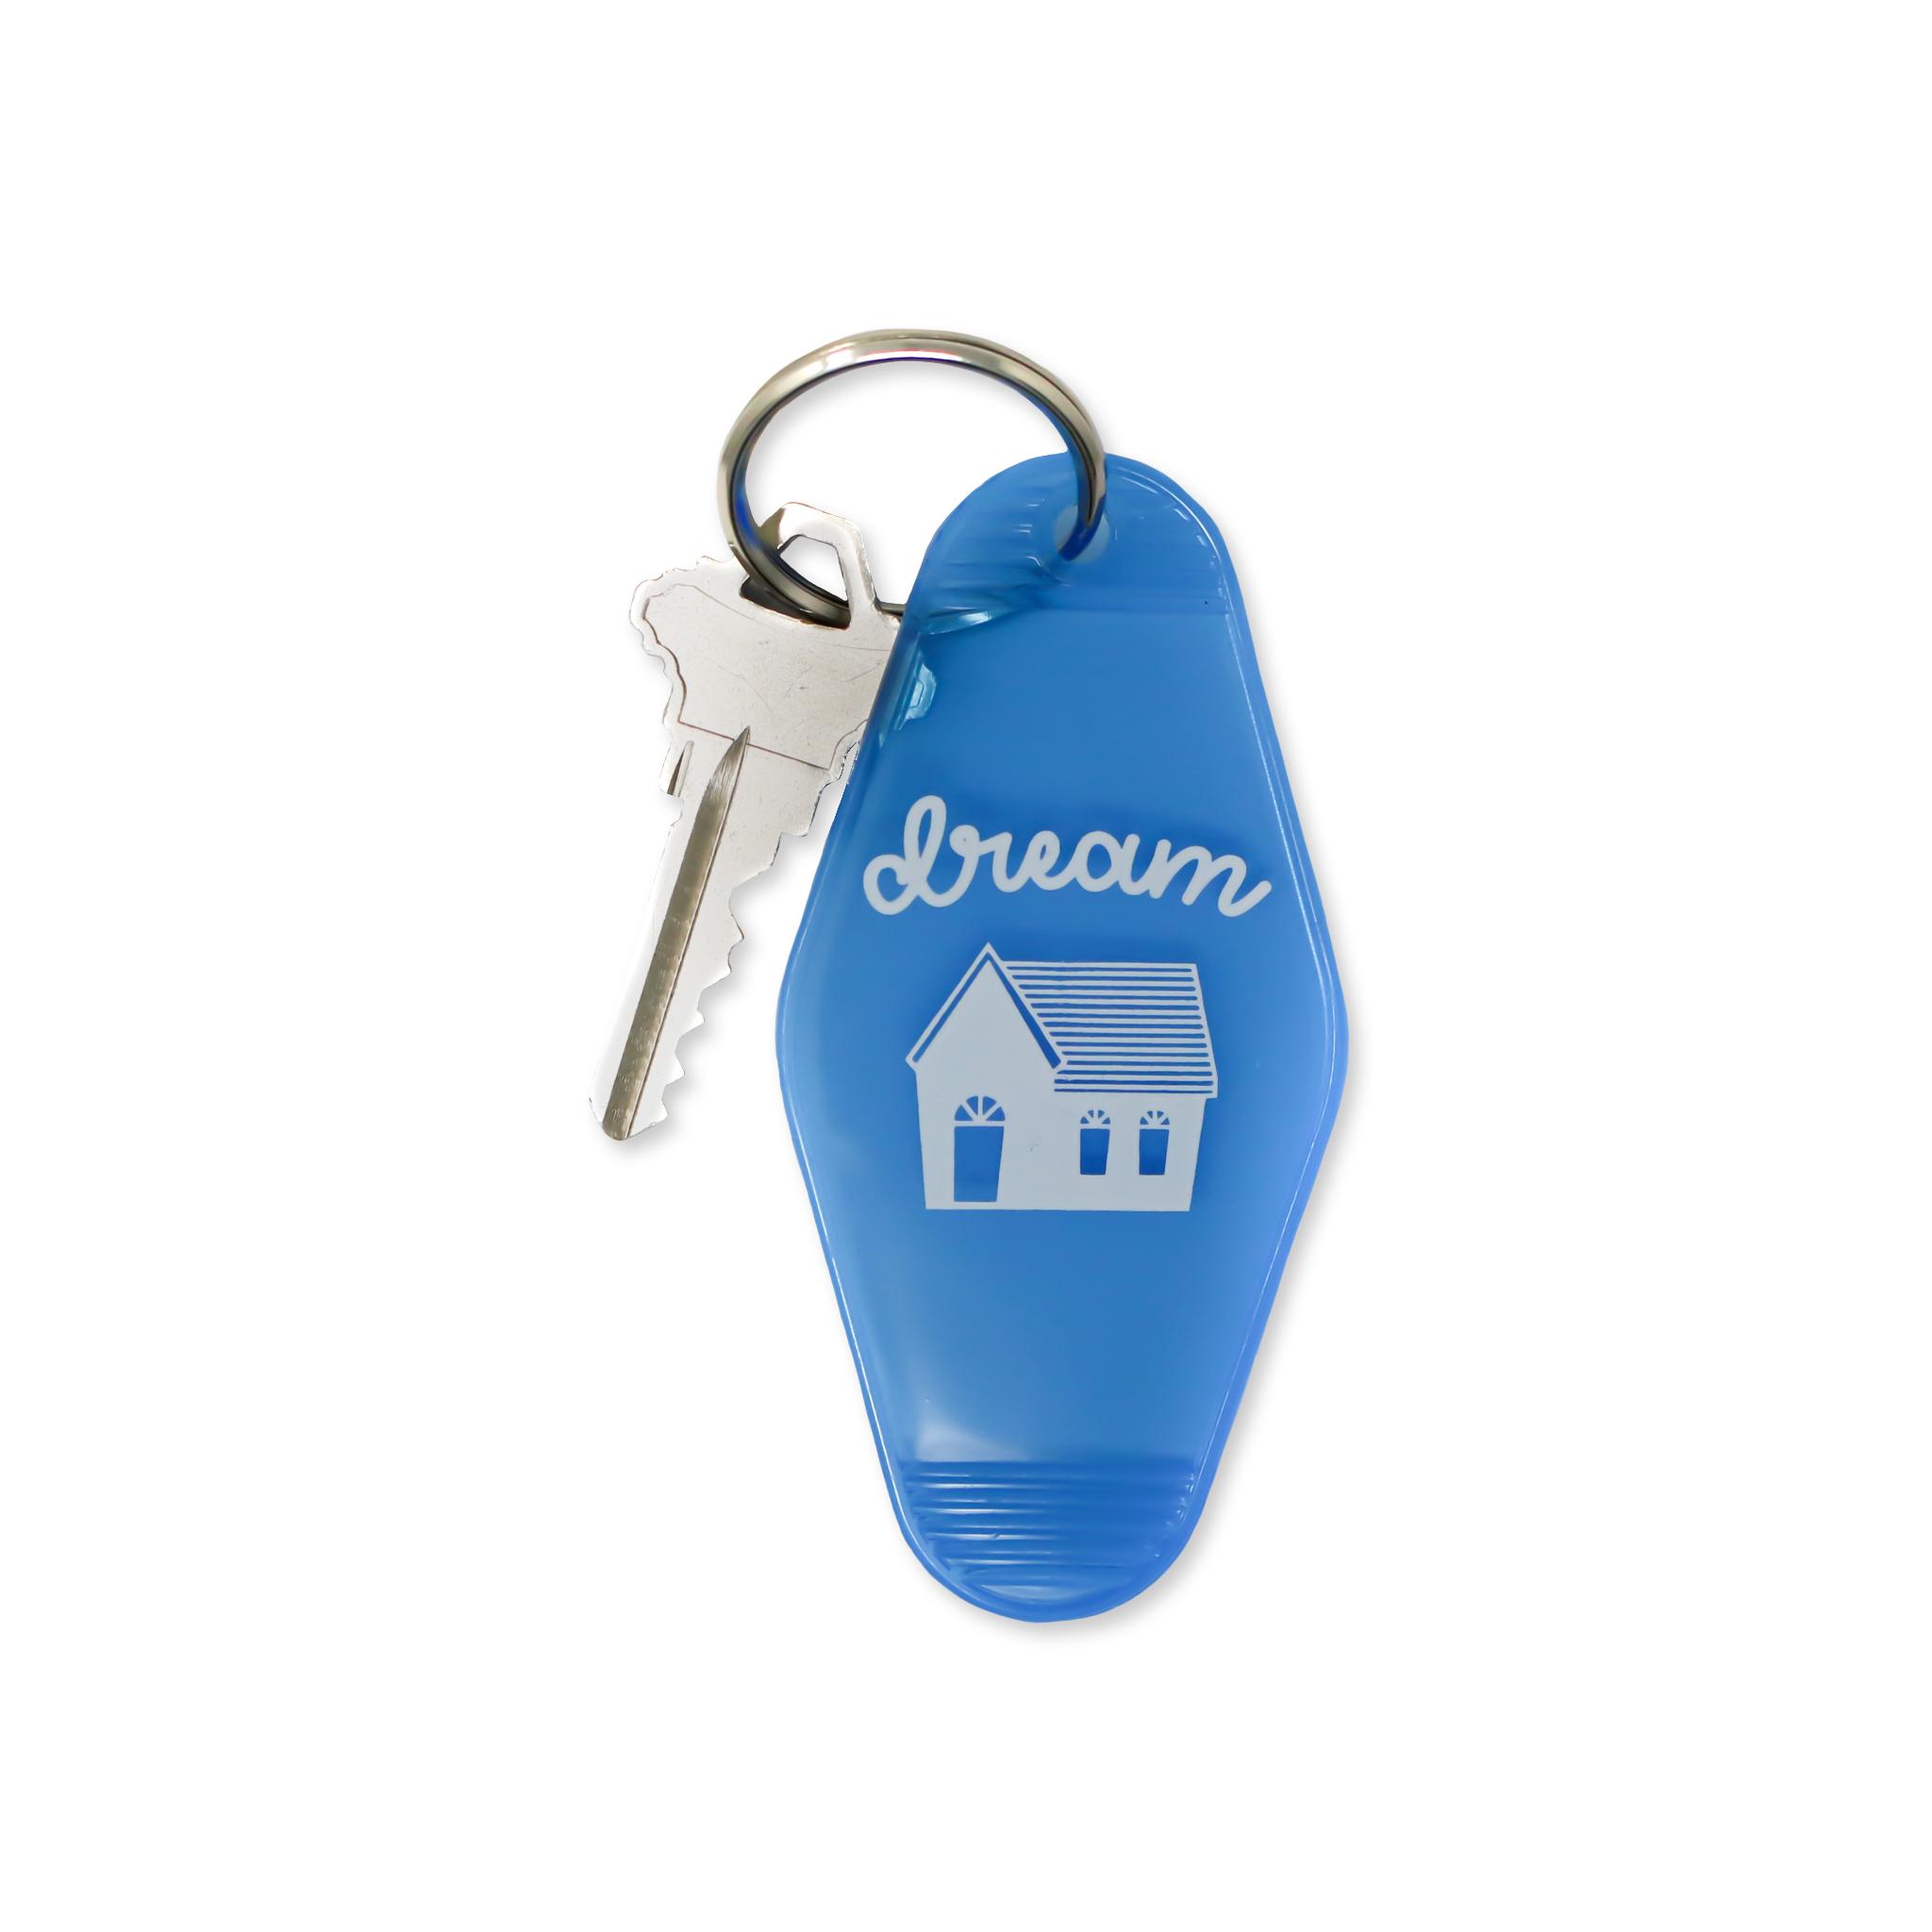 Dream House Key Tag Transparent Blue Blue Keychain Key Tags Red Keychain